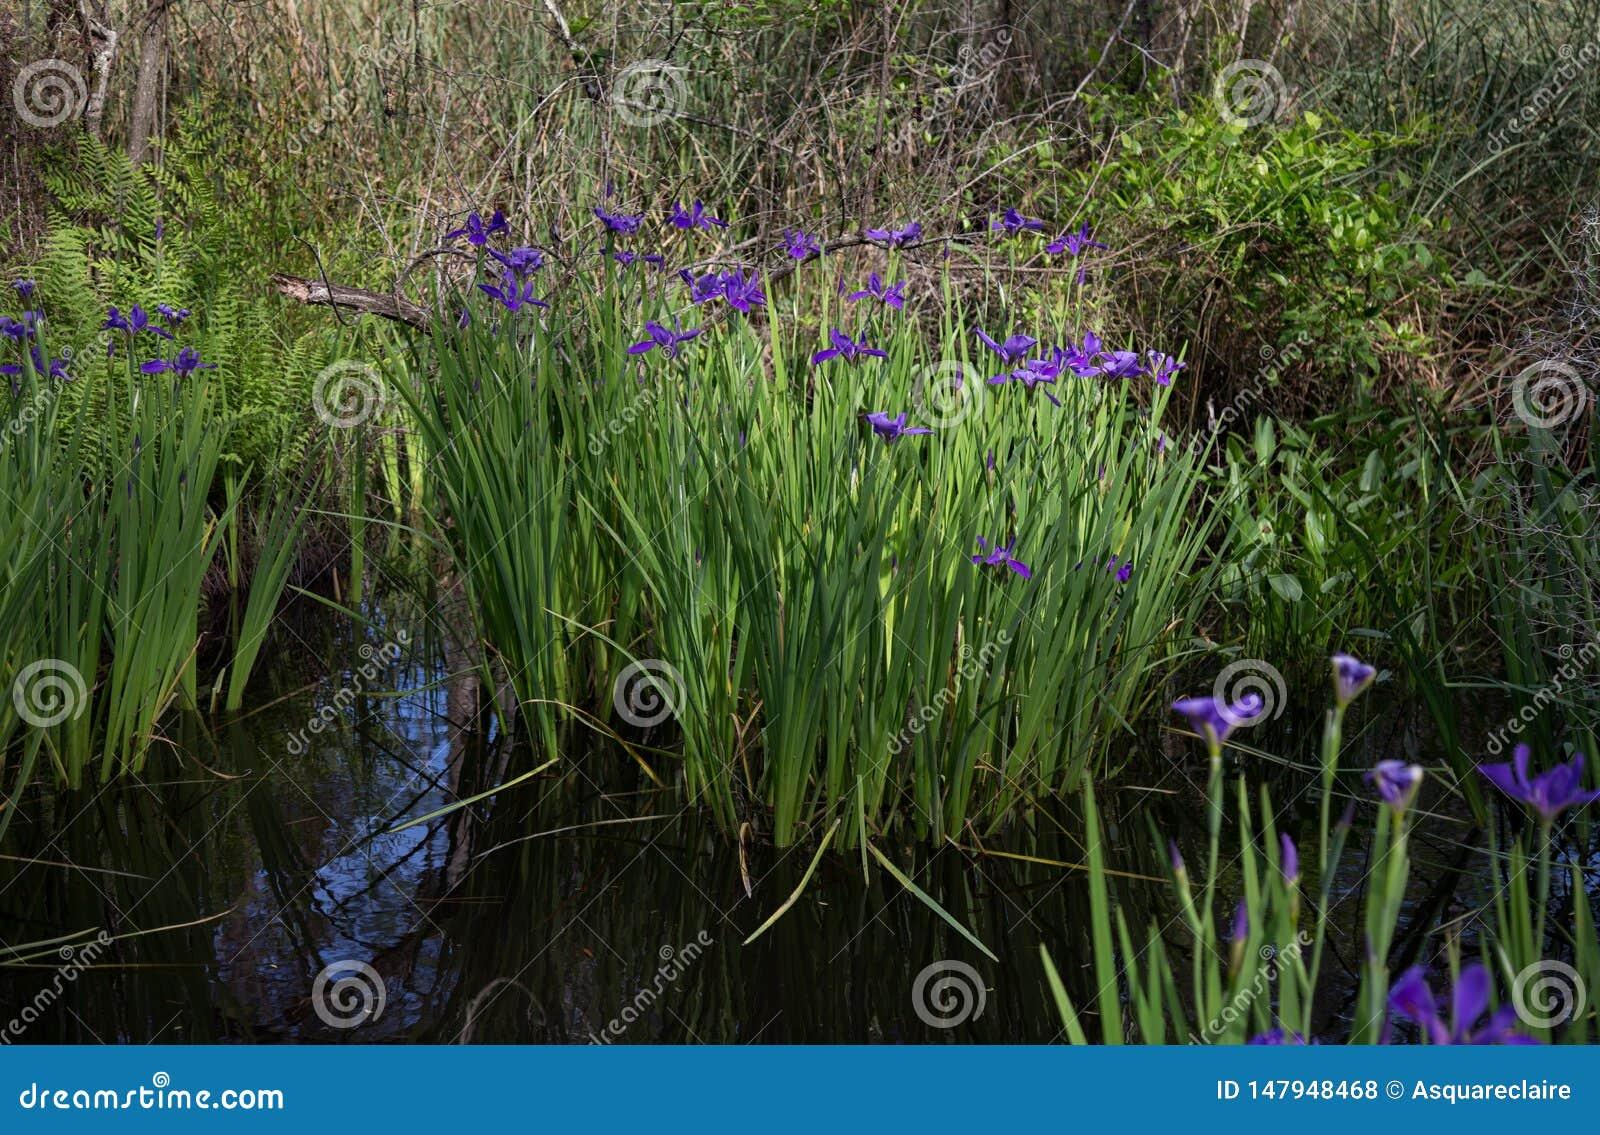 Purpurrote blaue Louisiana-Iris, die im Bayousumpfwasser wild wächst